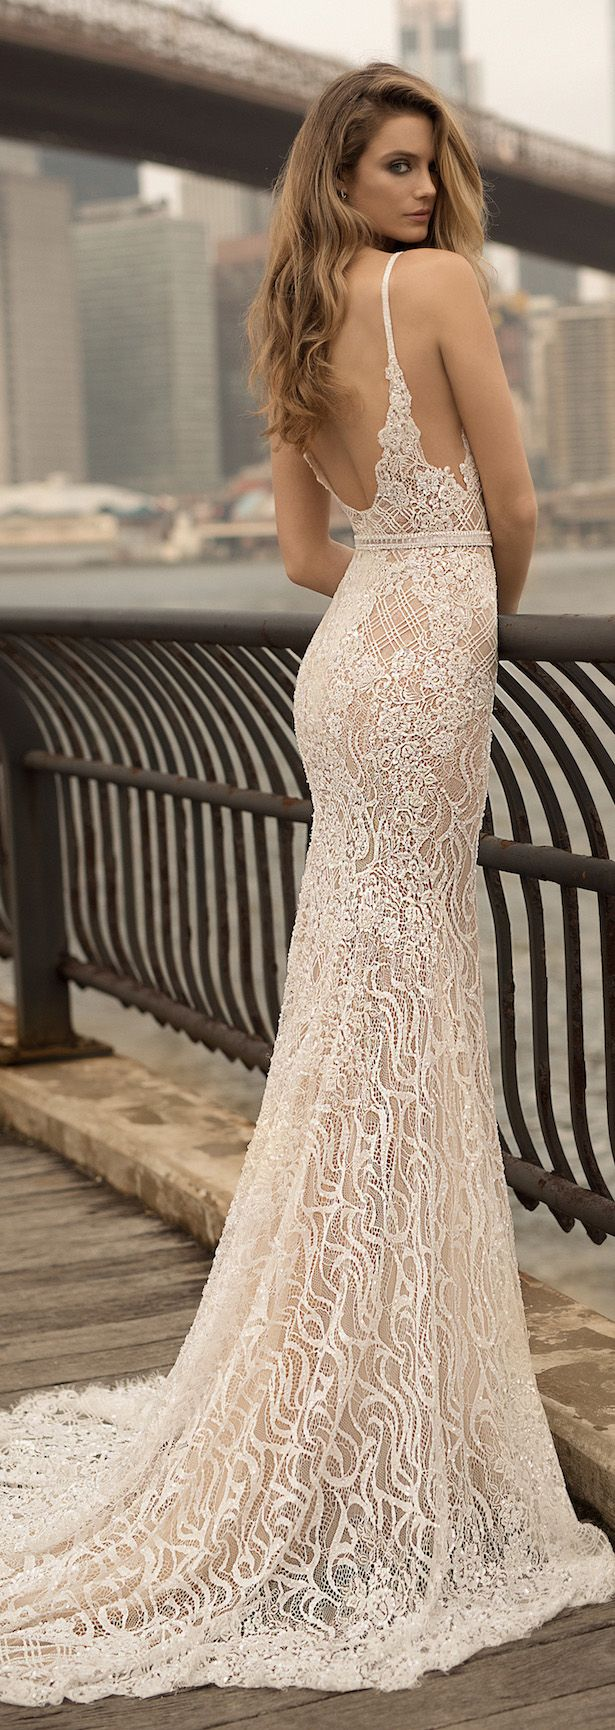 Berta wedding dress collection spring one day pinterest